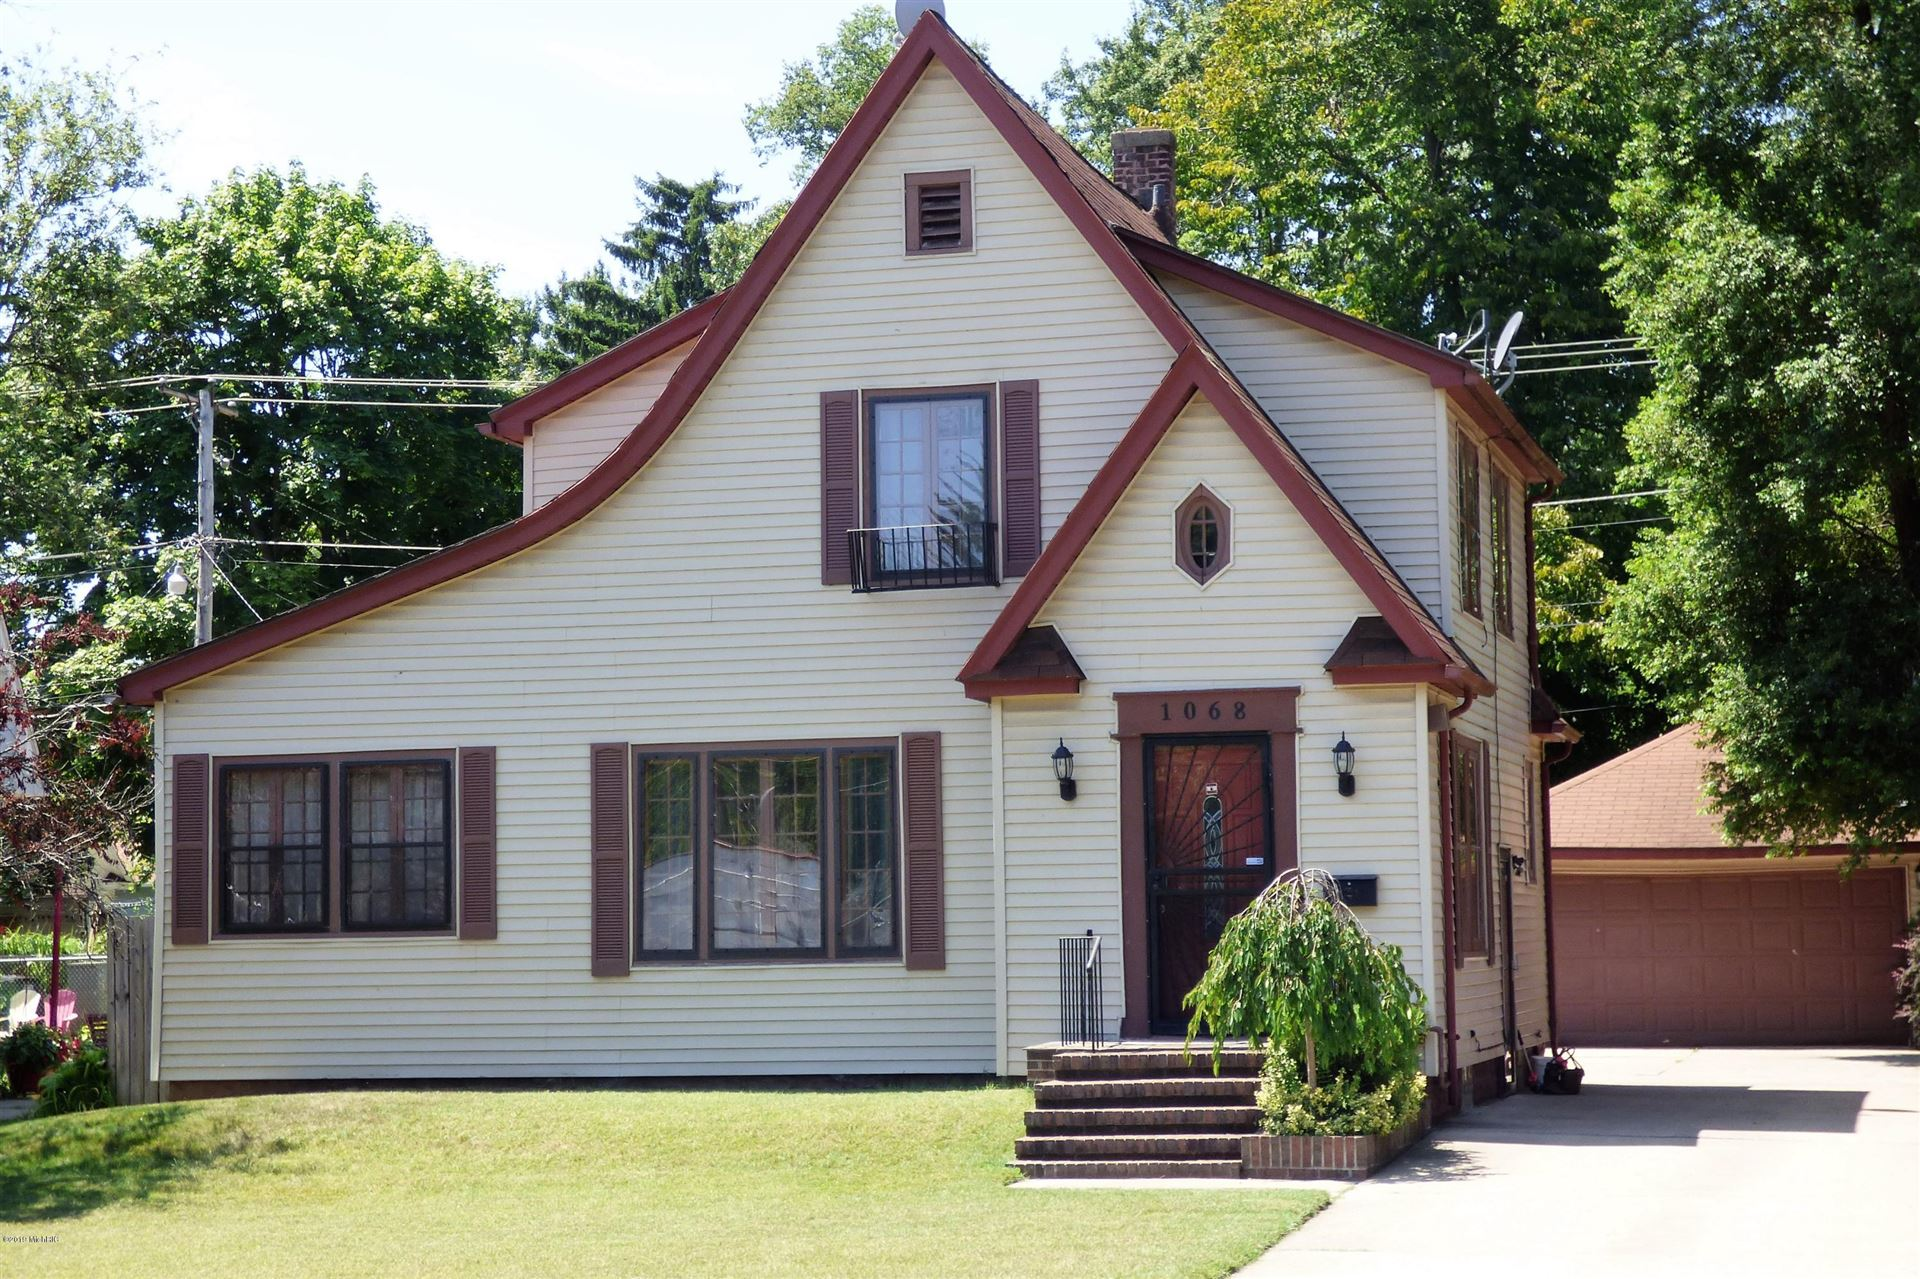 1068 Colfax Avenue, Benton Harbor, MI 49022 - MLS#: 20040798